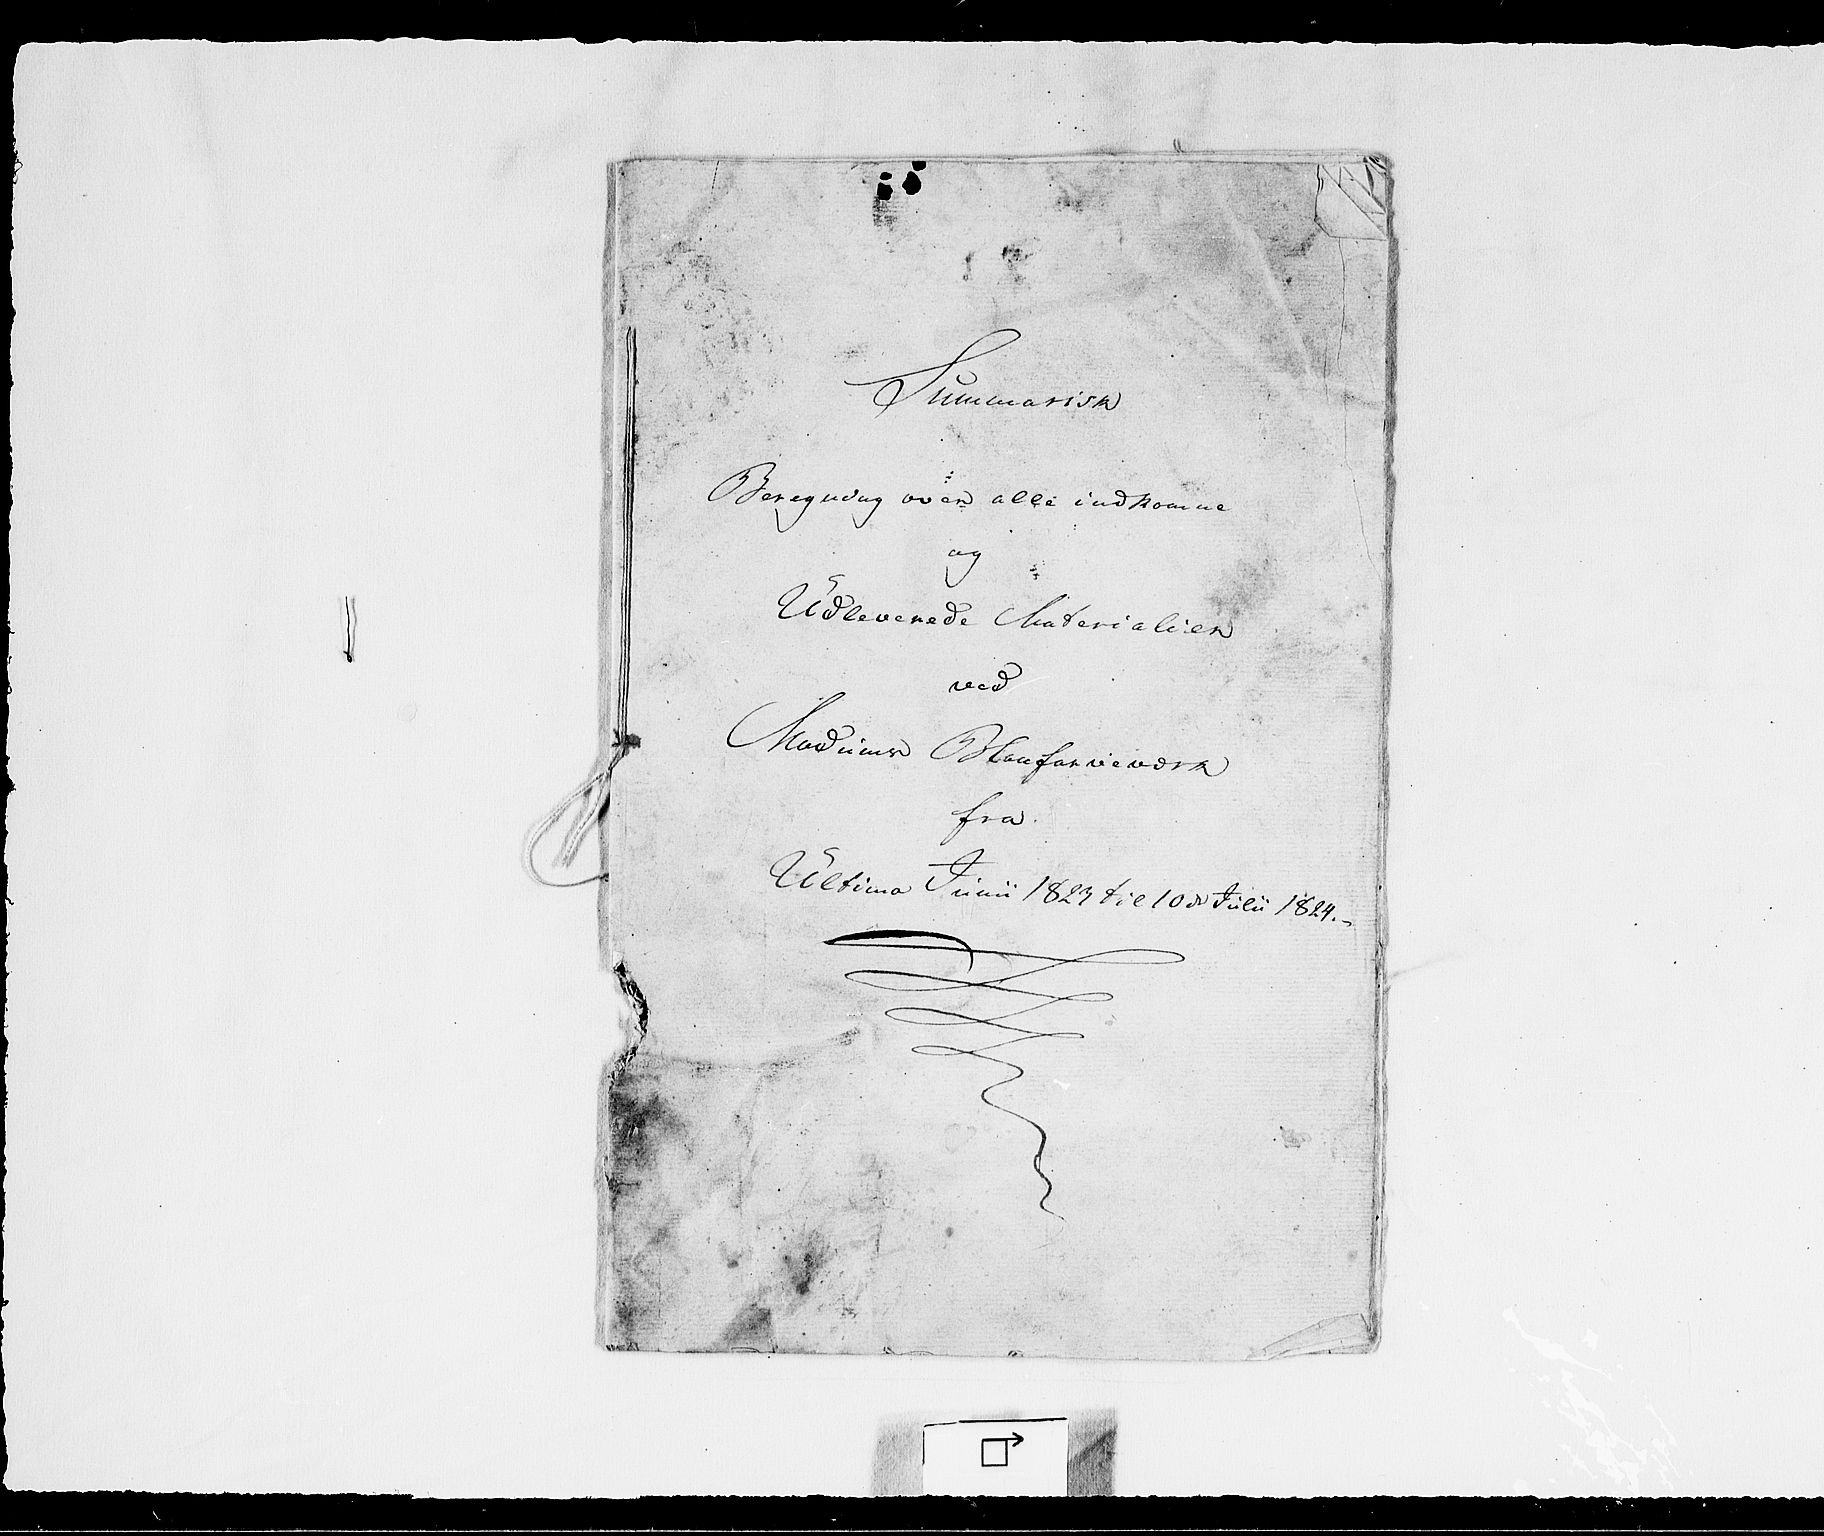 RA, Modums Blaafarveværk, G/Gd/Gdd/L0245, 1823-1829, s. 2